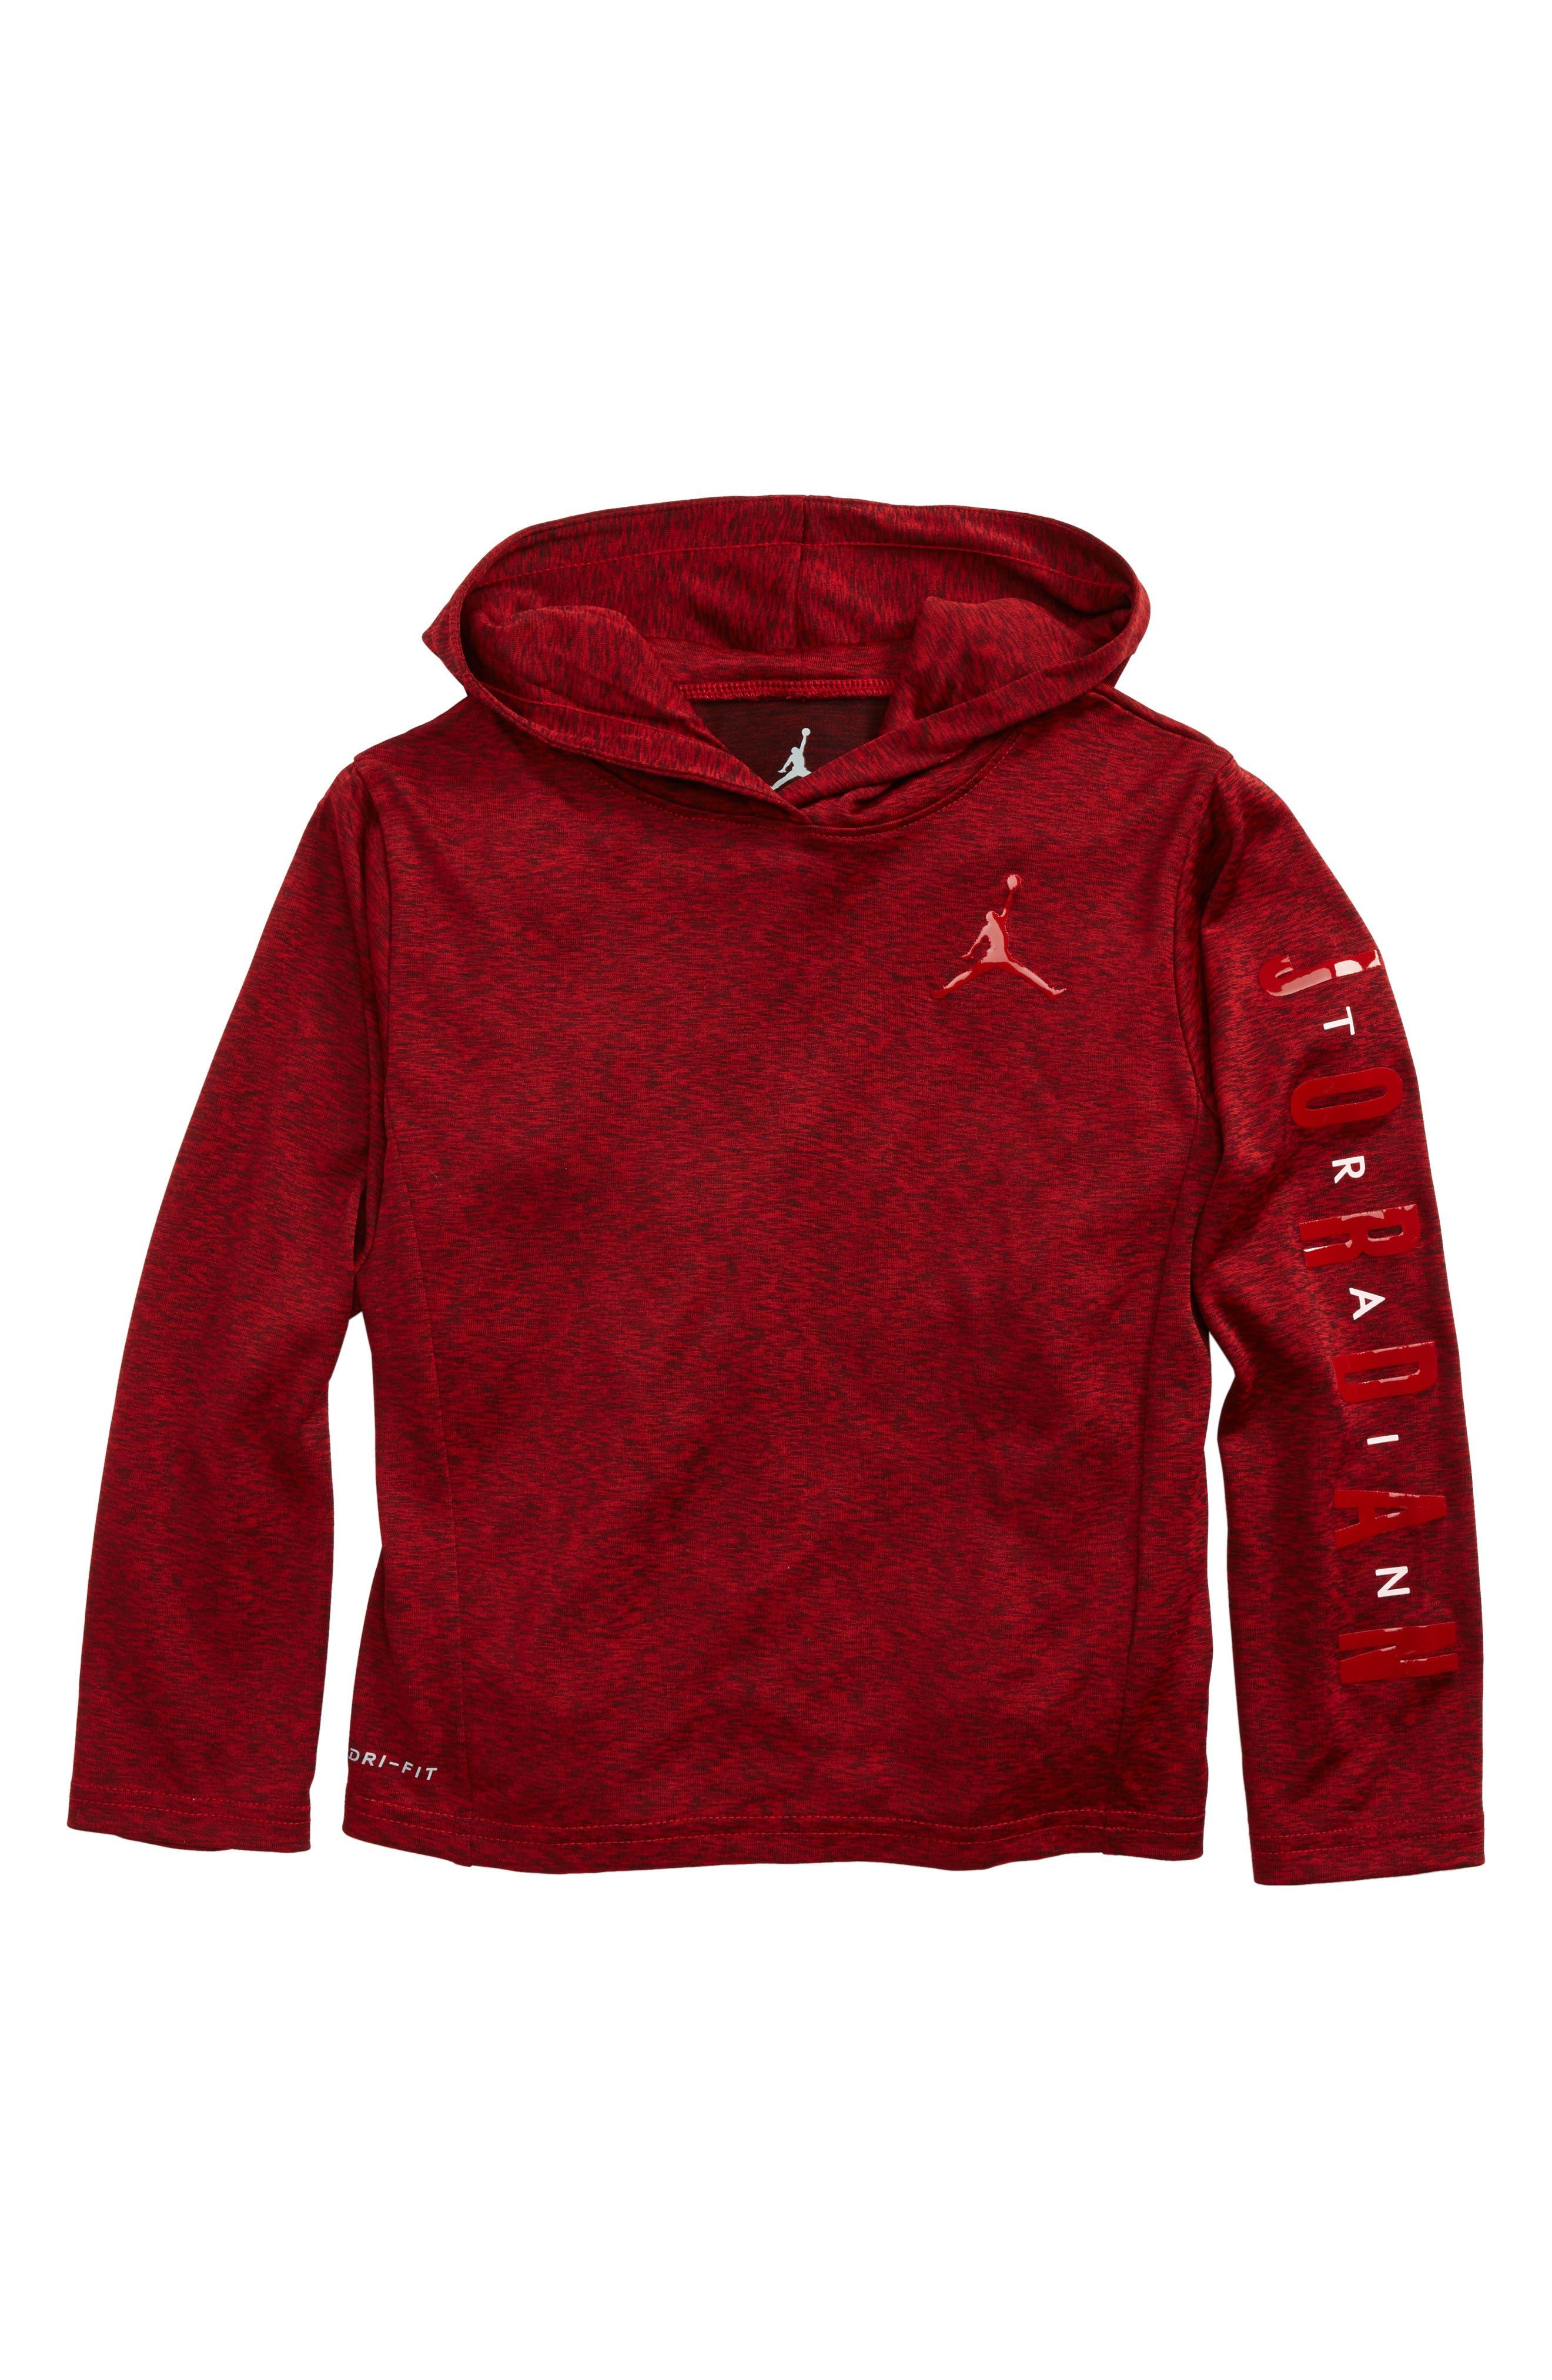 Jordan Dri-FIT Hooded T-Shirt (Toddler Boys & Little Boys)